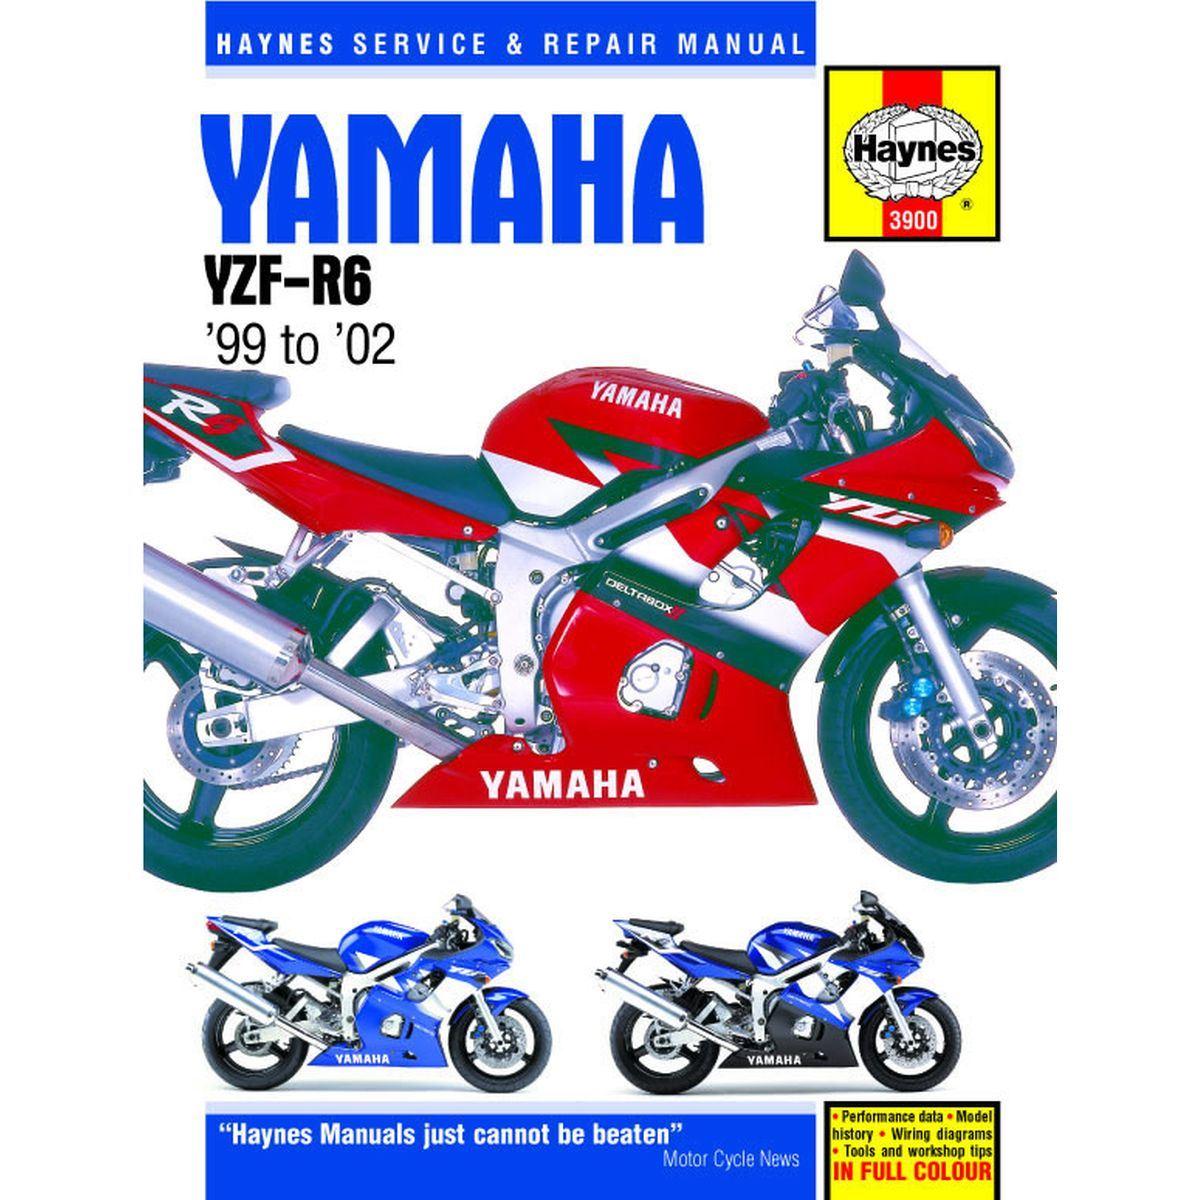 hight resolution of manual haynes for 2000 yamaha yzf r6 5eb5 ebay rh ebay co uk 2000 yamaha r6 headlight wiring diagram 2000 yamaha r6 headlight wiring diagram